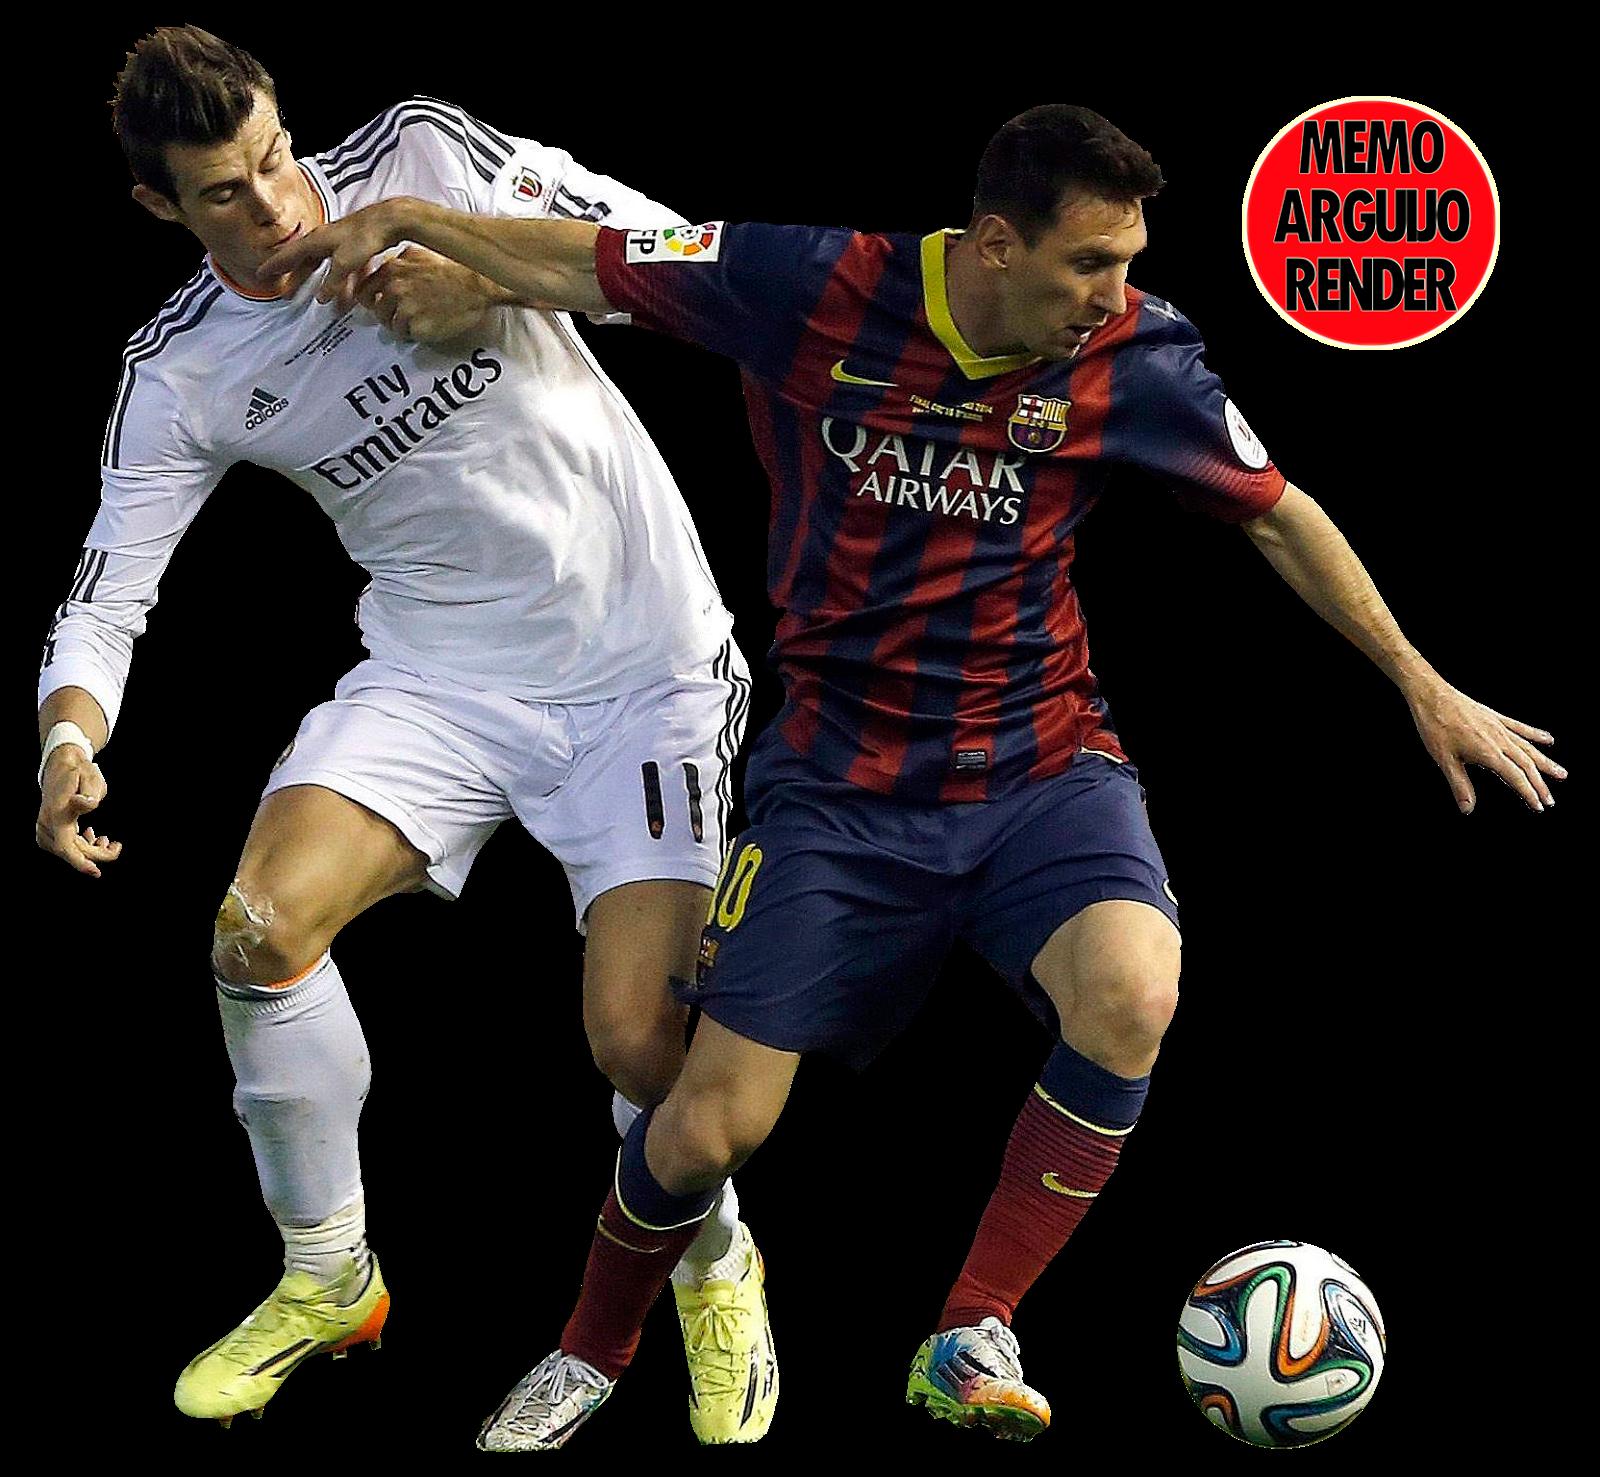 Celta Vigo Vs Barcelona You Tube: Promocionado Por / Sponsored By